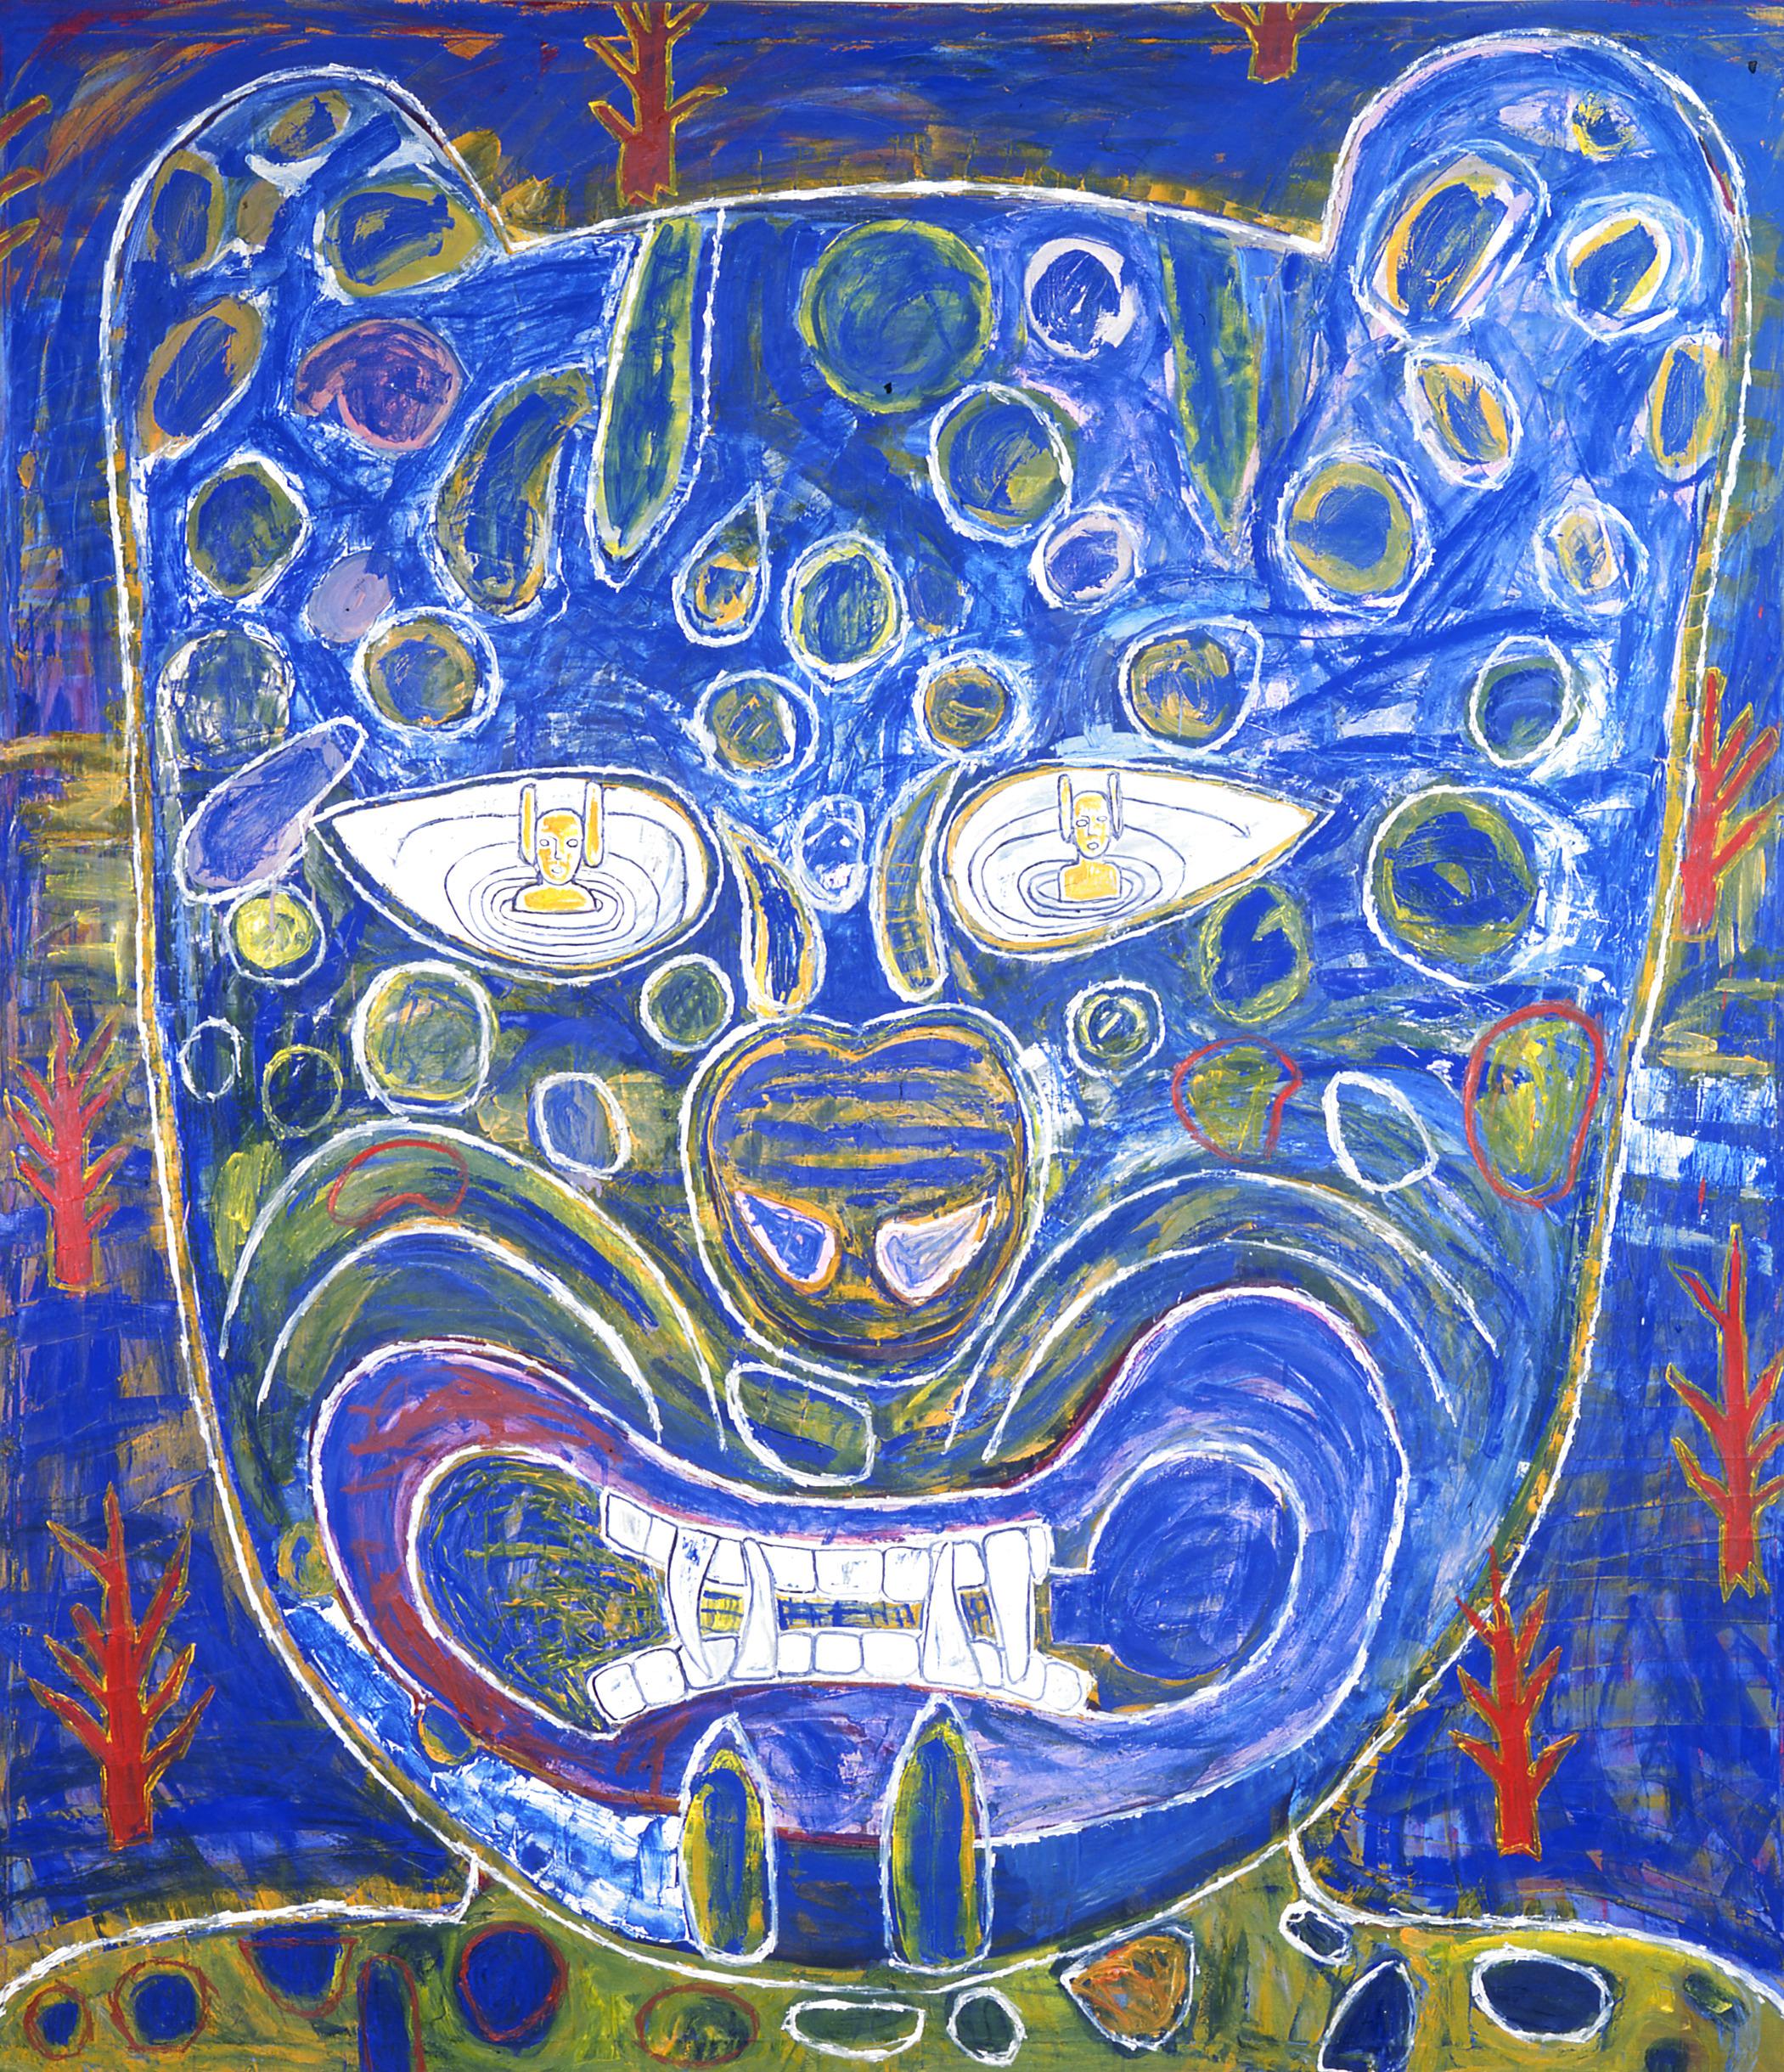 Raúl Piña 'Doble elipse de luna' 1998